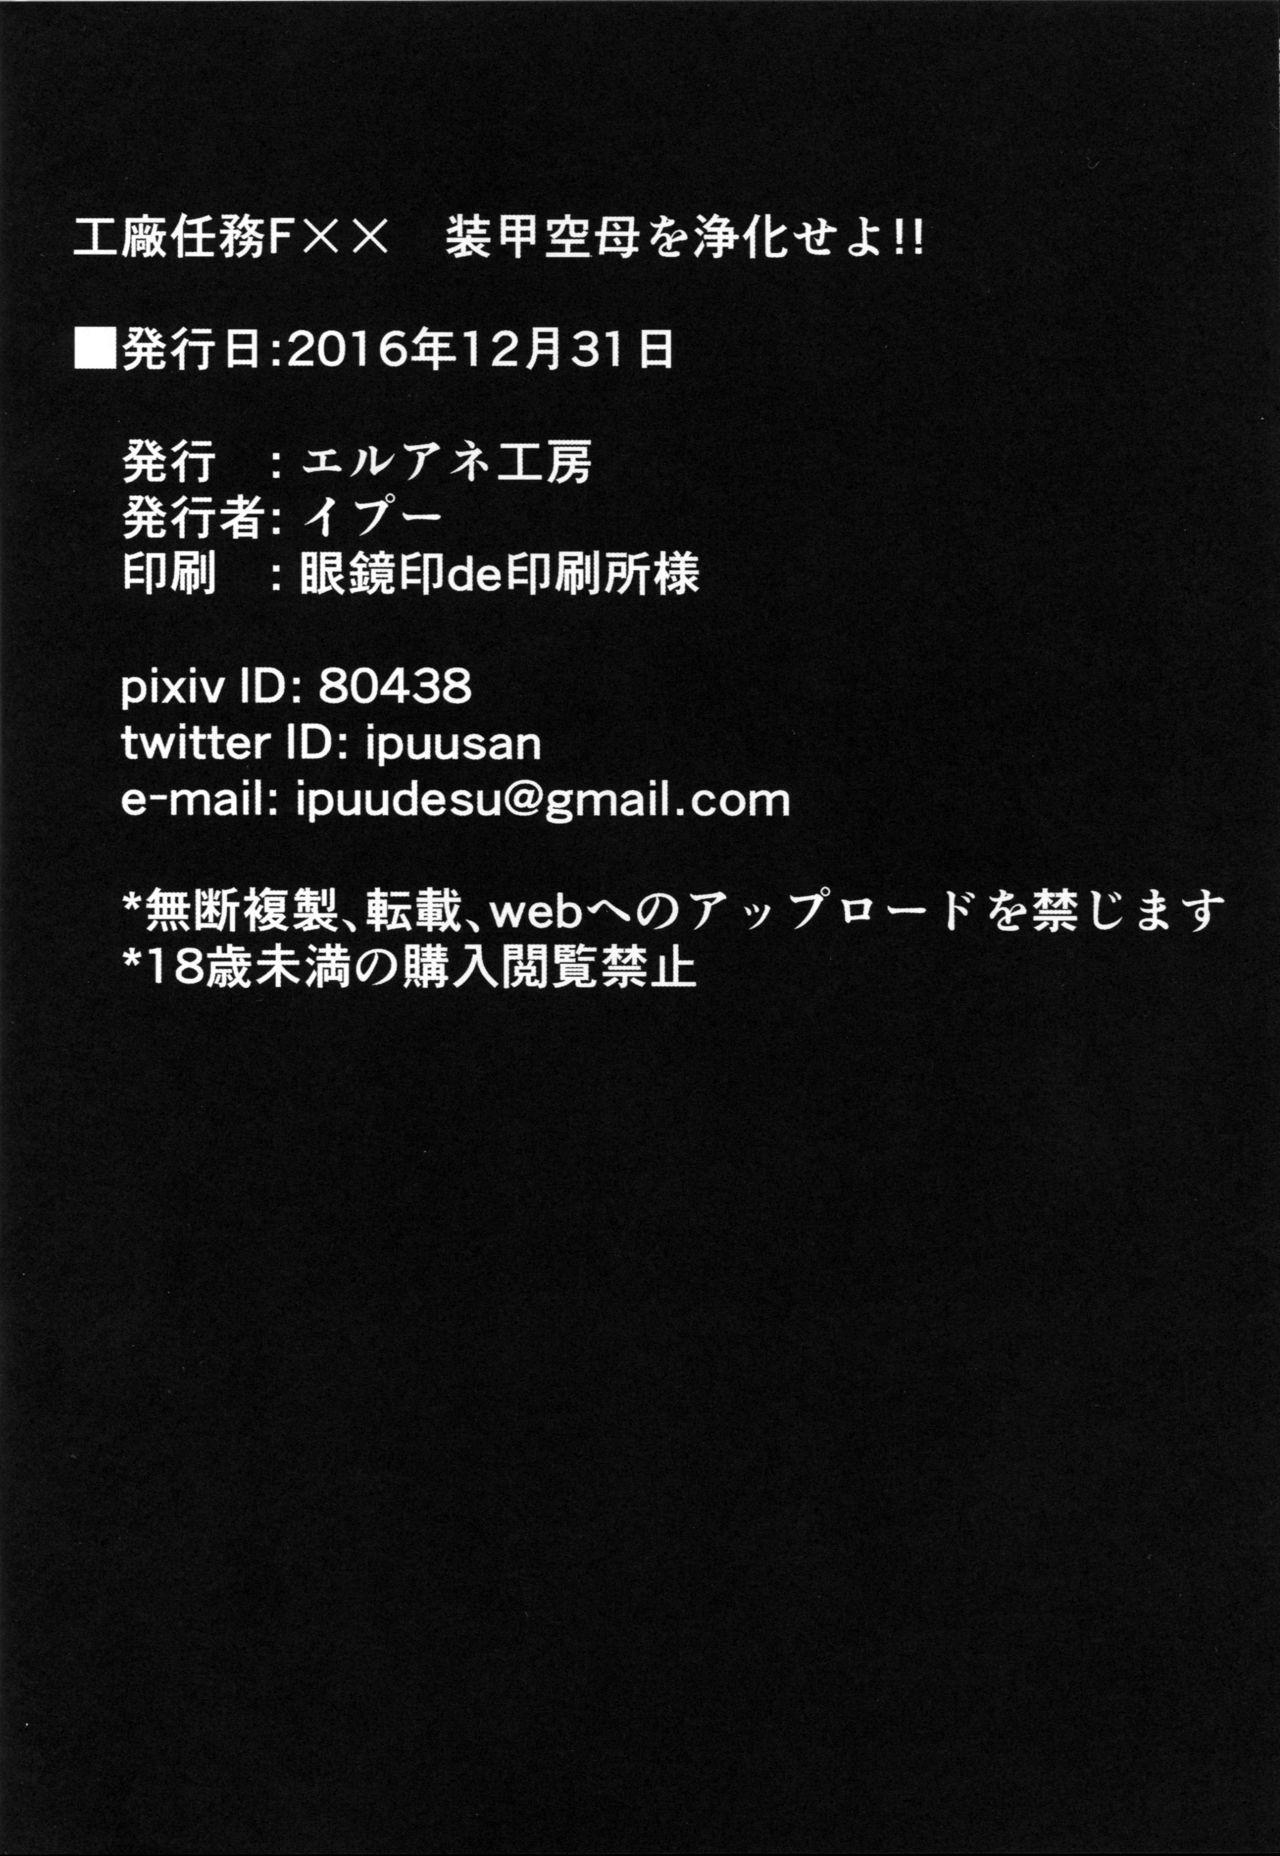 Koushou Ninmu FXX Soukou Kuubo o Jouka Seyo!! 24